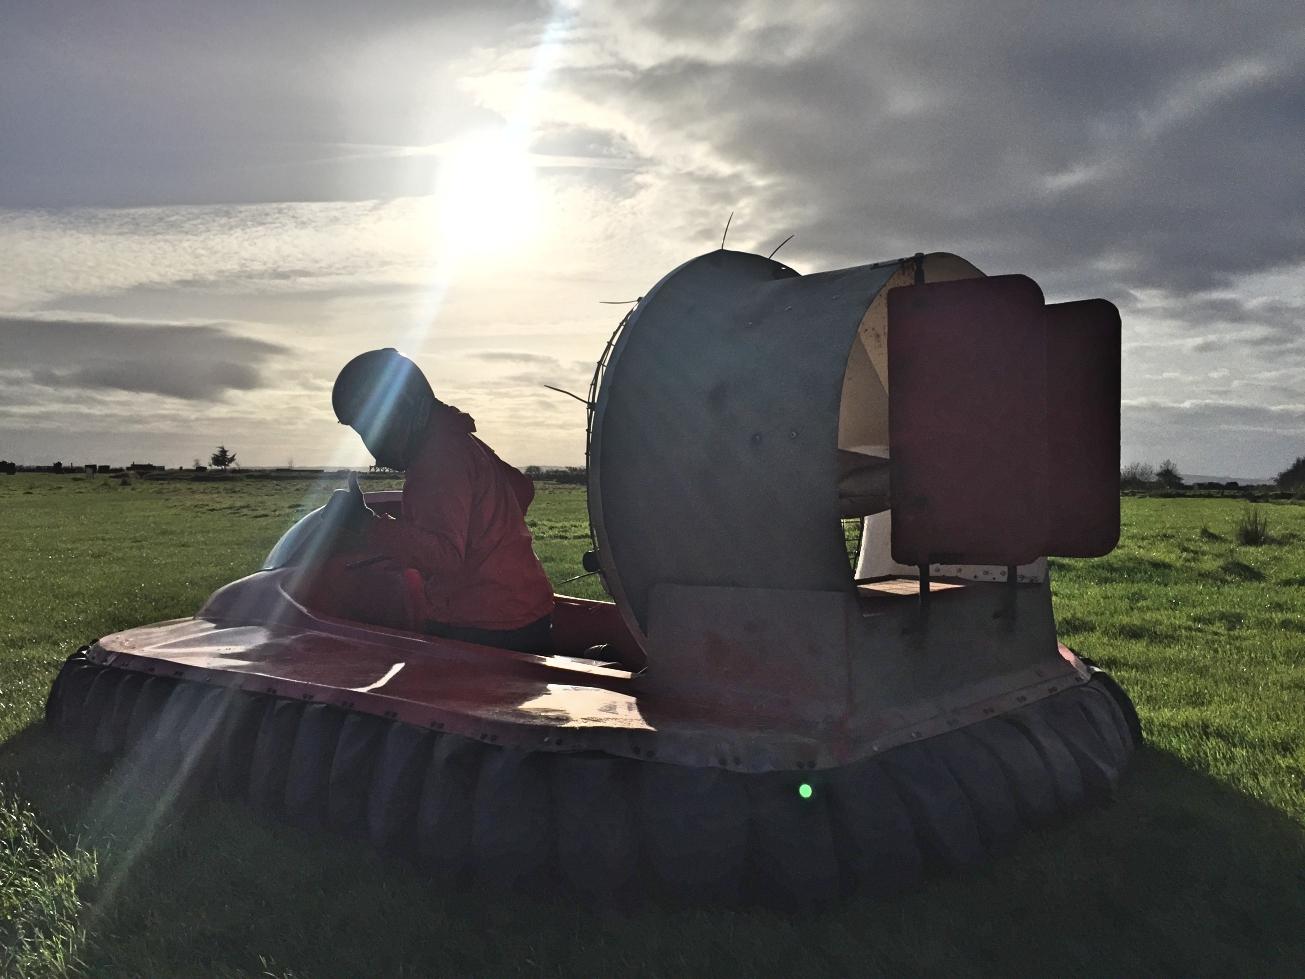 limavady_foylehov_hovercraft_niexplorer_ni_explorer_northern_ireland (16).jpg